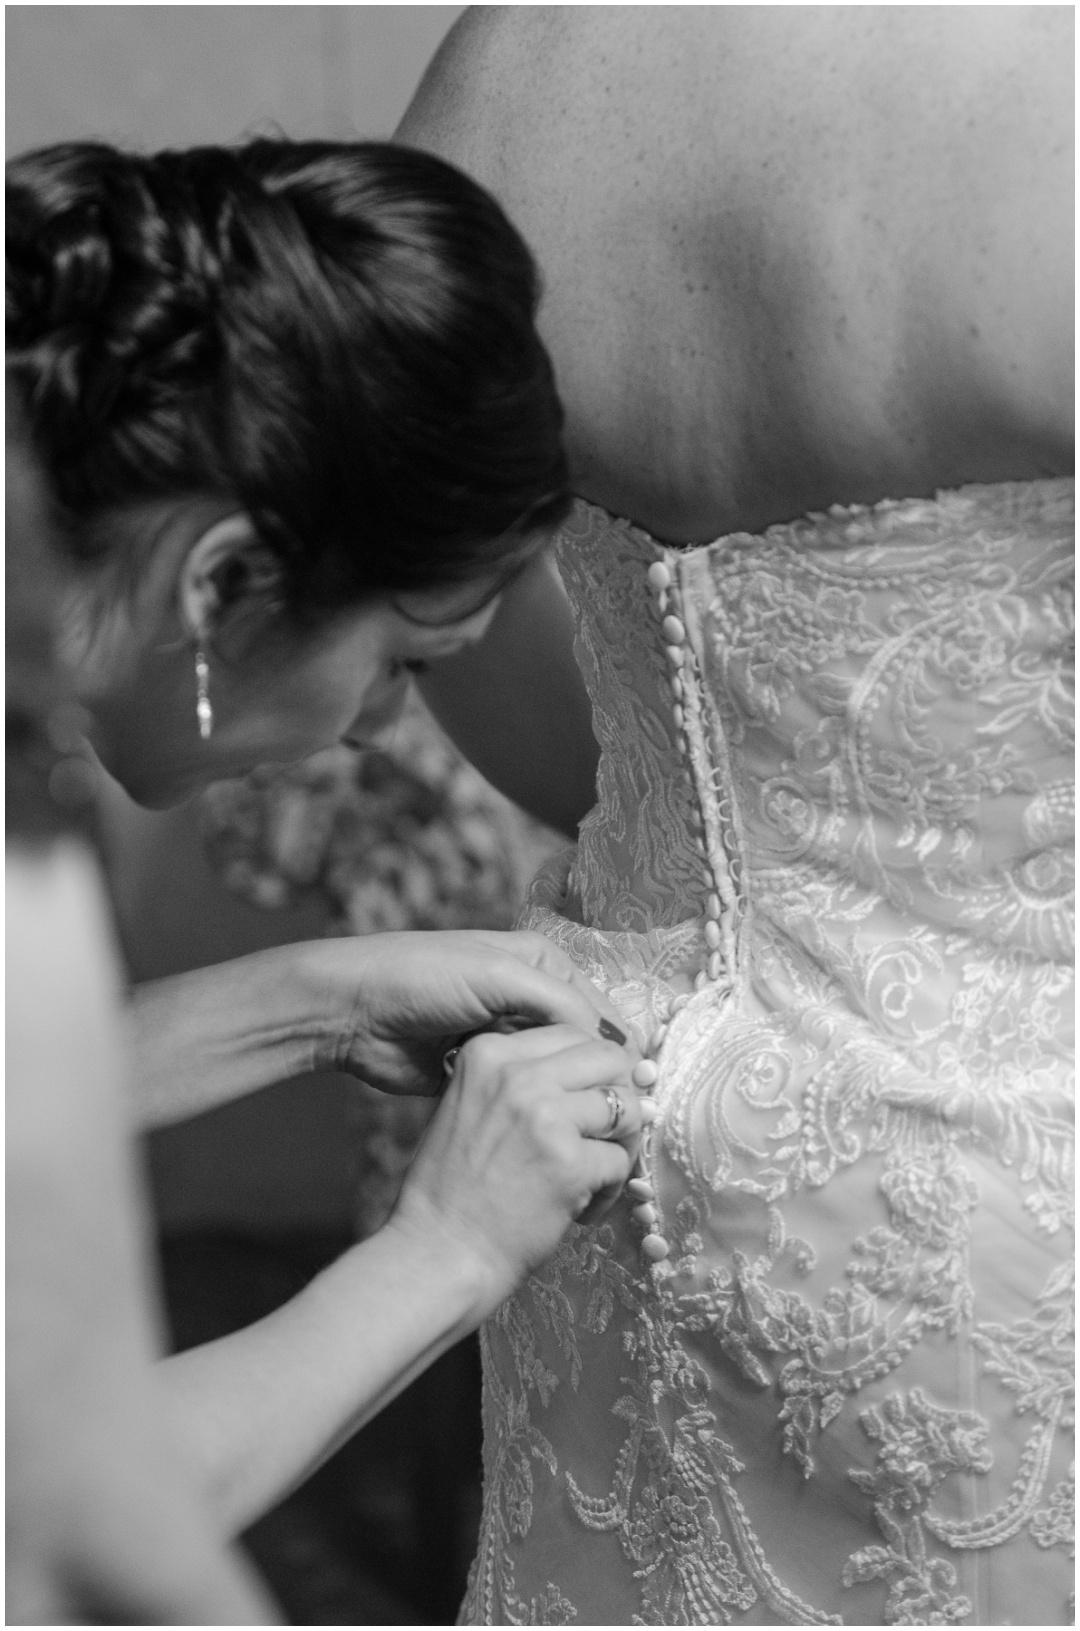 The-Grand-Wedding-Photos-Aaron-Haslinger-Photography_0003.jpg